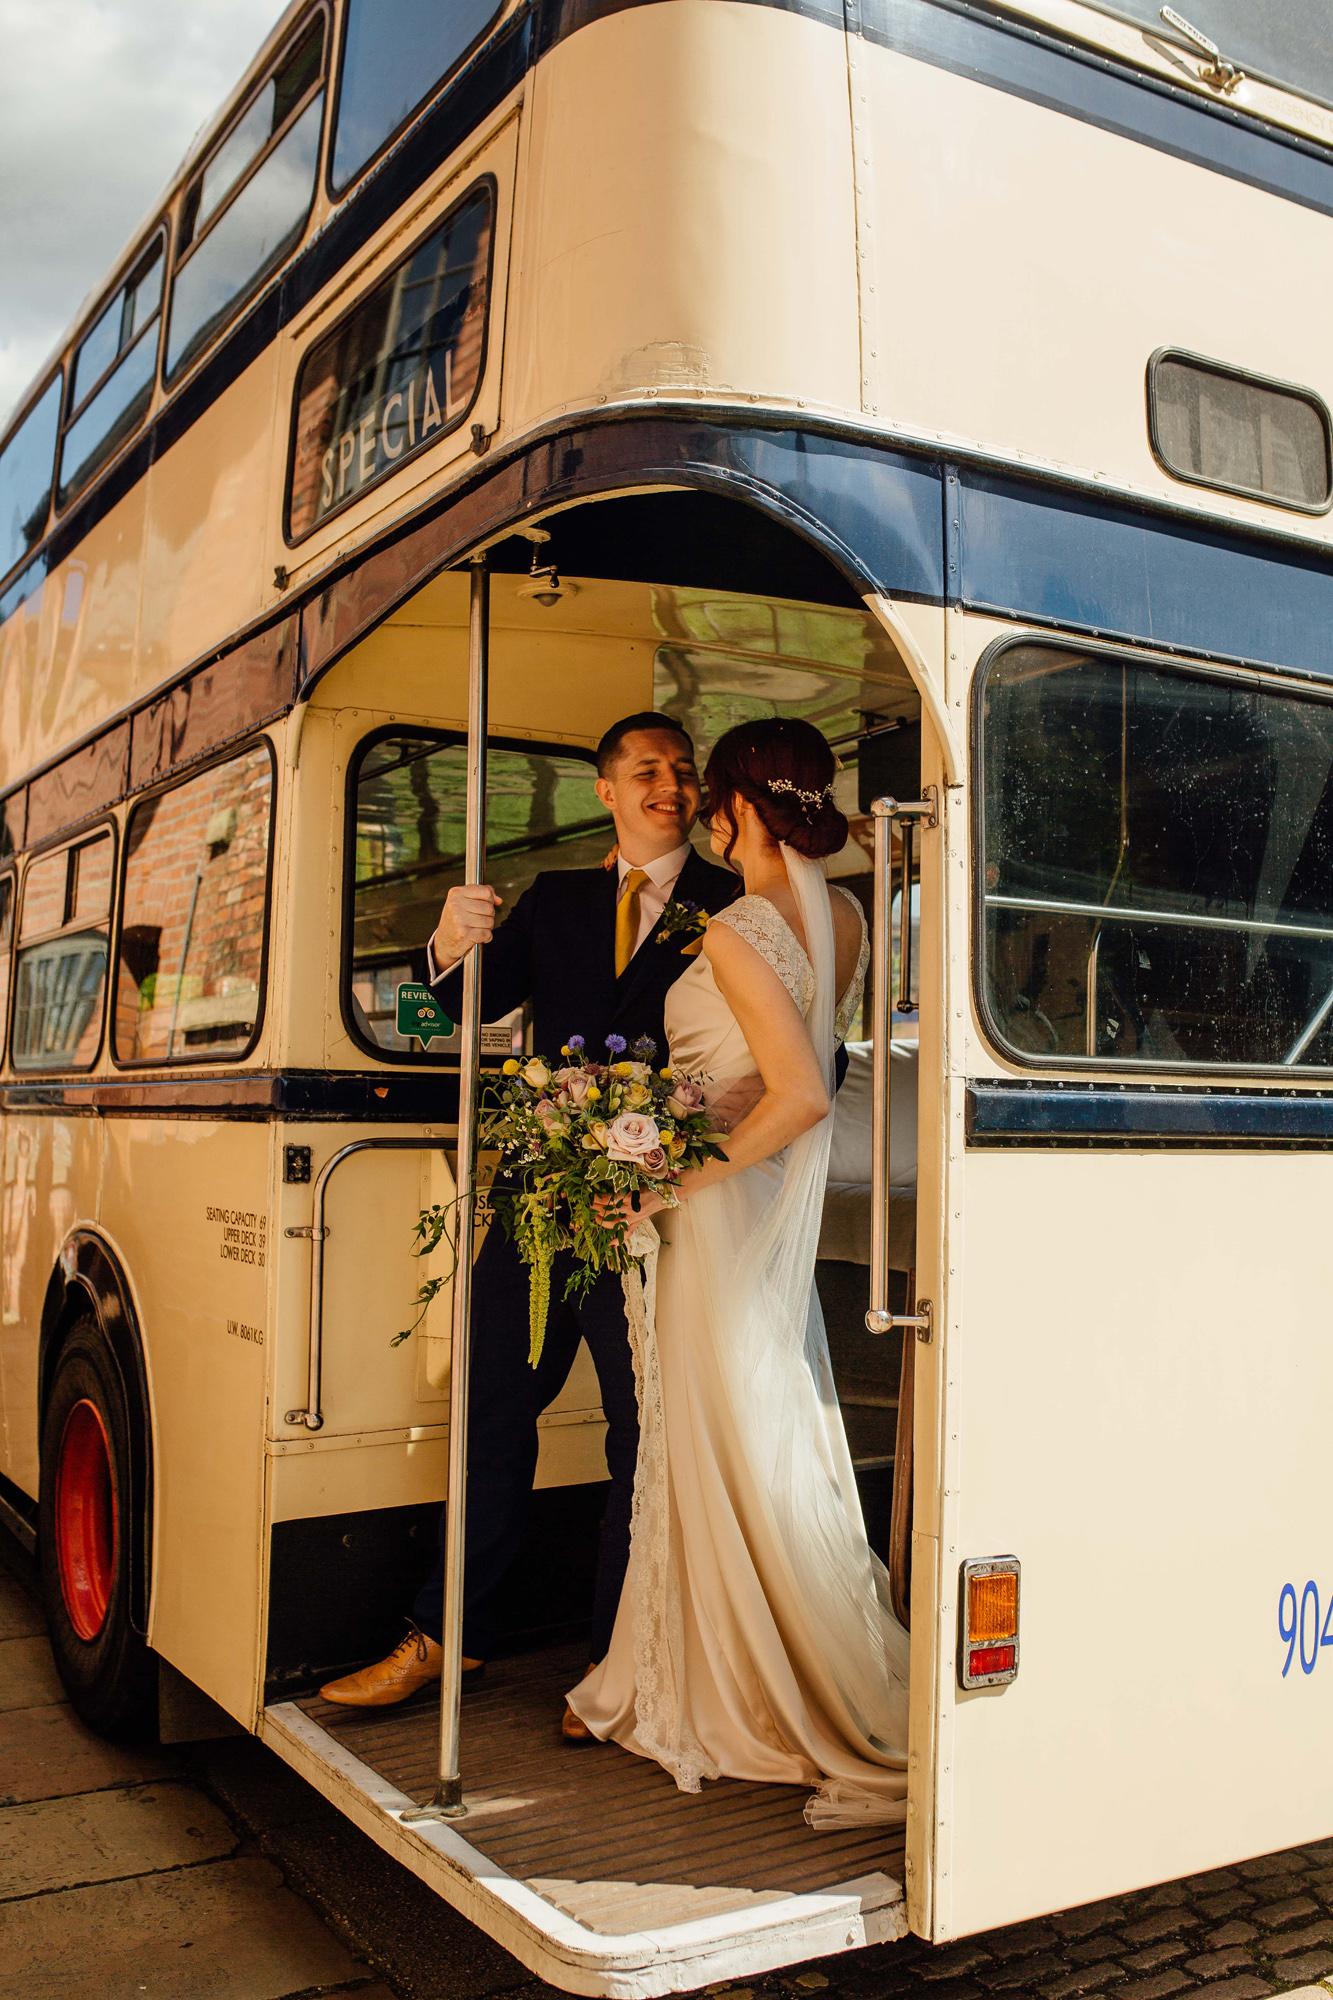 Sarah-Honeysuckle-Bias-Cut-Silk-Vintage-Inspired-Wedding-Gown-Sheffield-Wedding-Kate-Beaumont-38.jpg